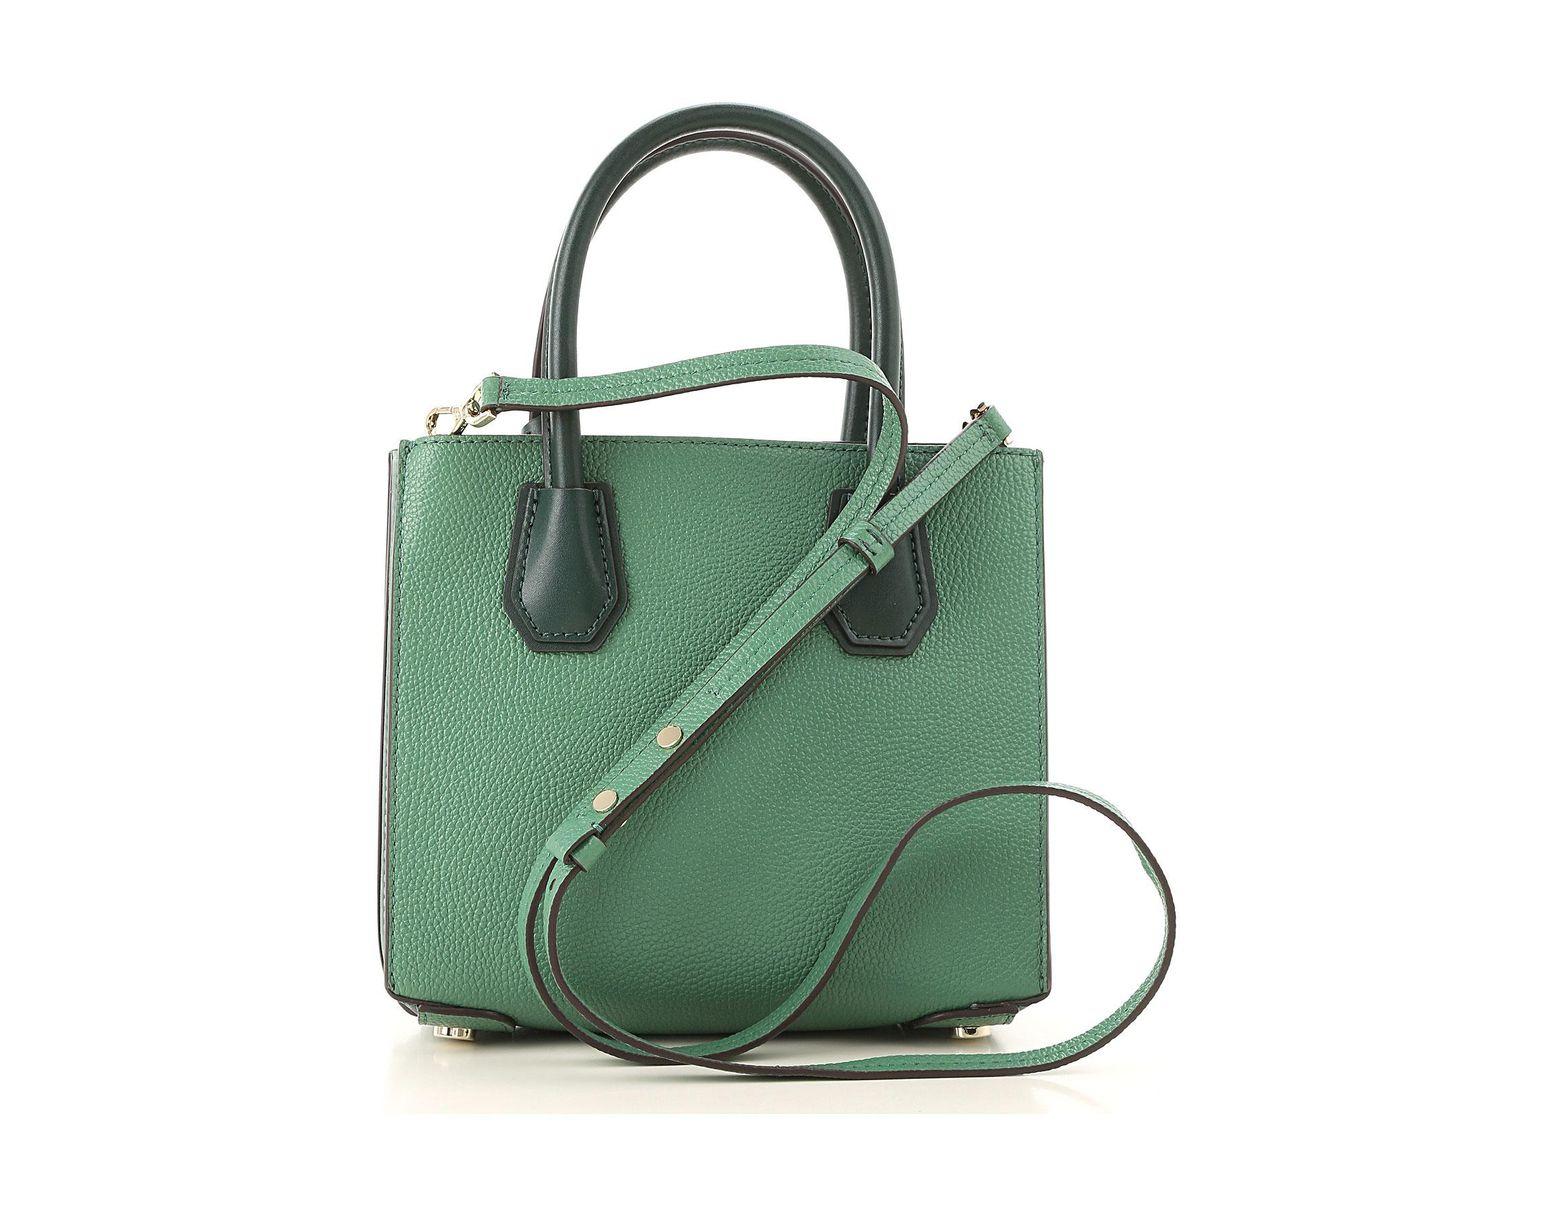 1b6b477b202971 Michael Kors Handbags in Green - Lyst